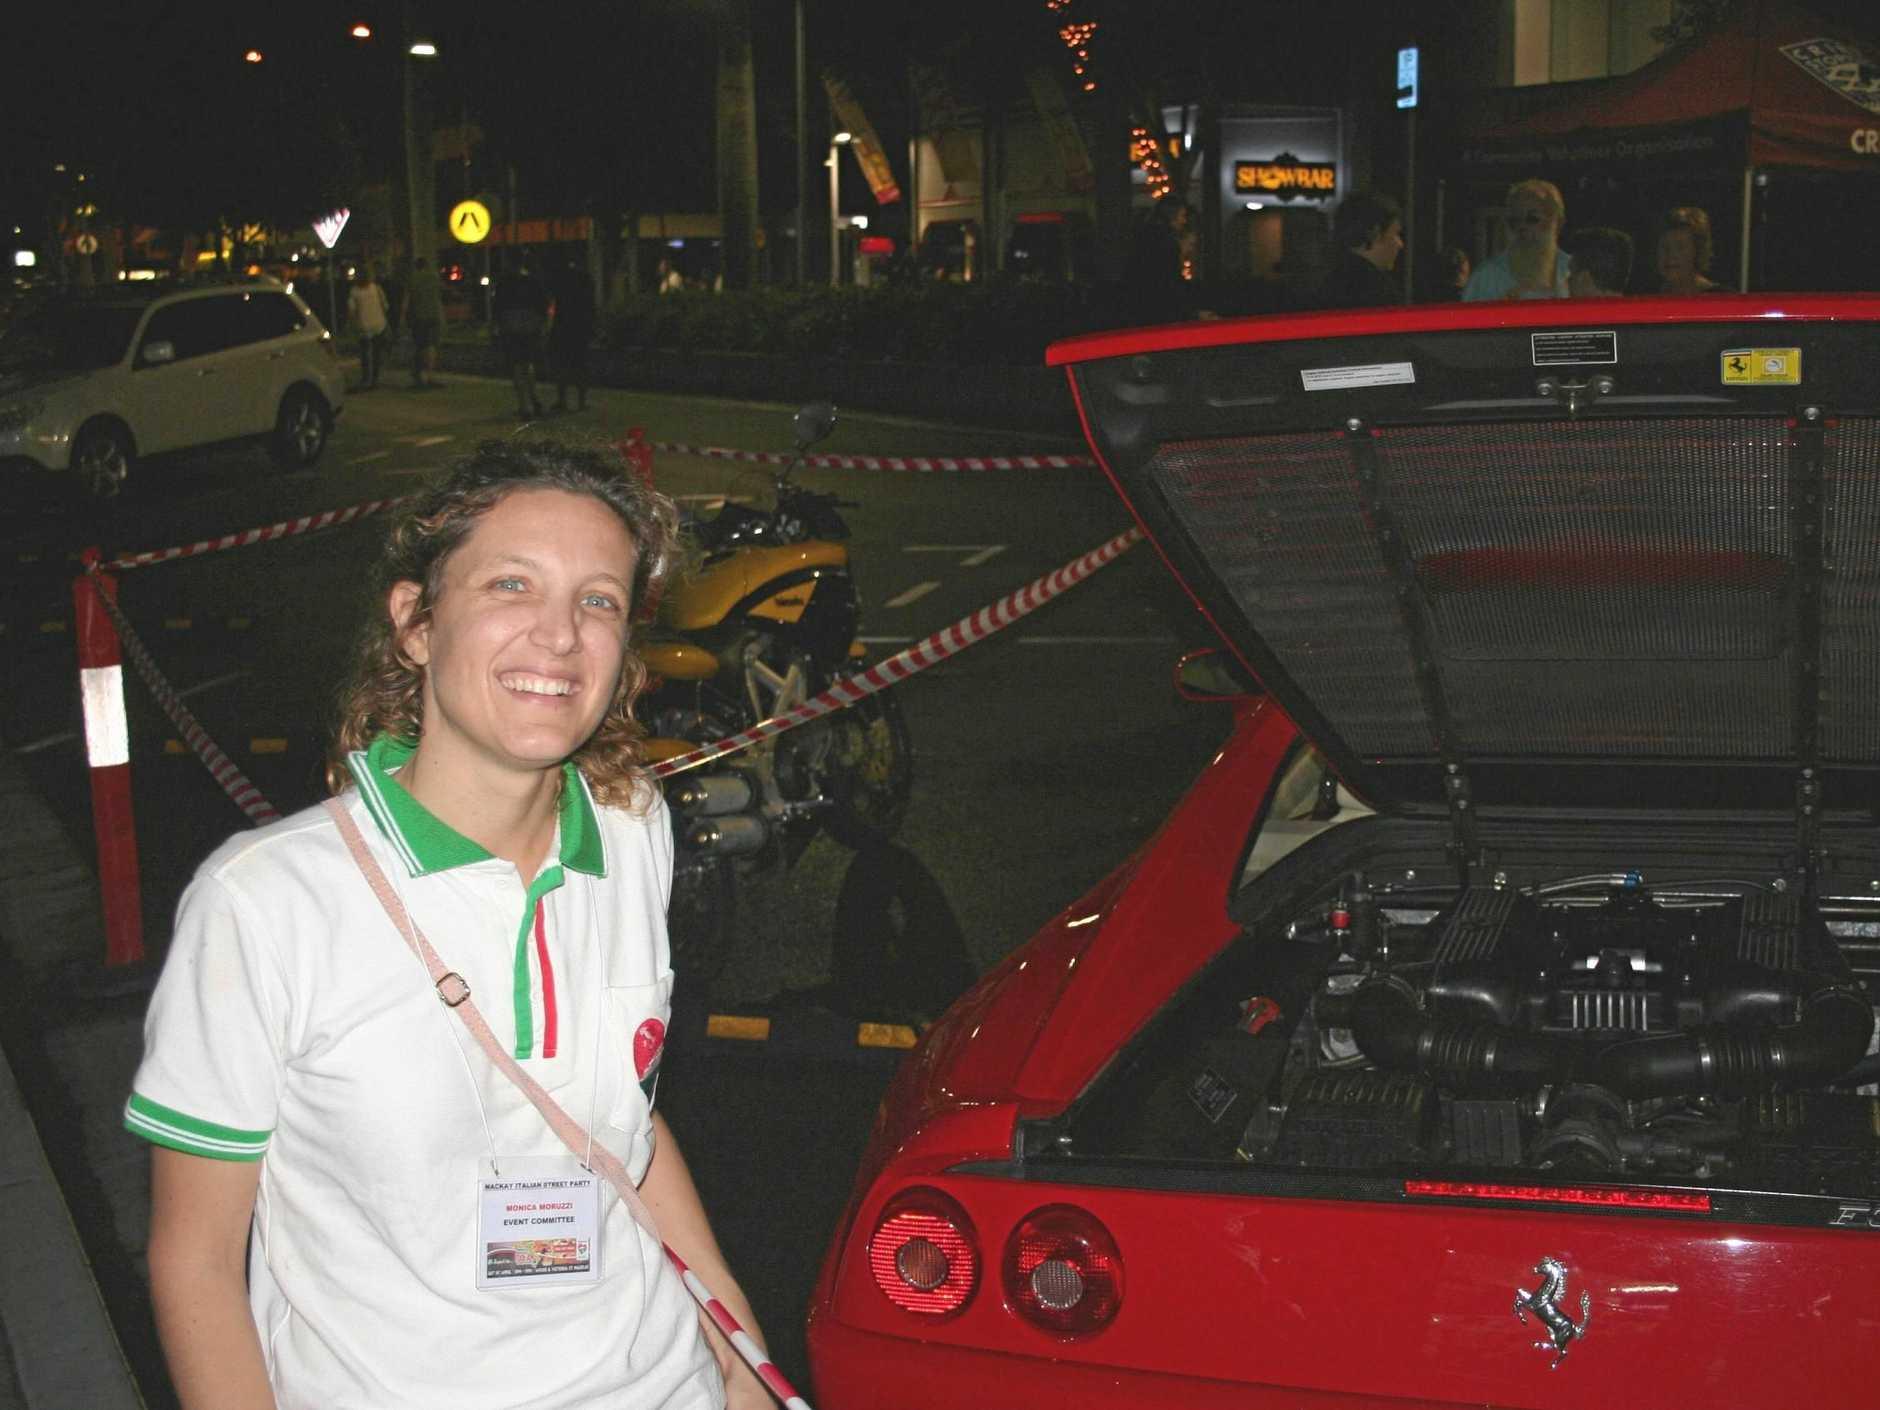 MKY150418 Monica Moruzzi from the Mackay and Districts Italian Association posing next to a Ferrari F355 Berlinetta at the Mackay Italian Street Party on April 14 2018